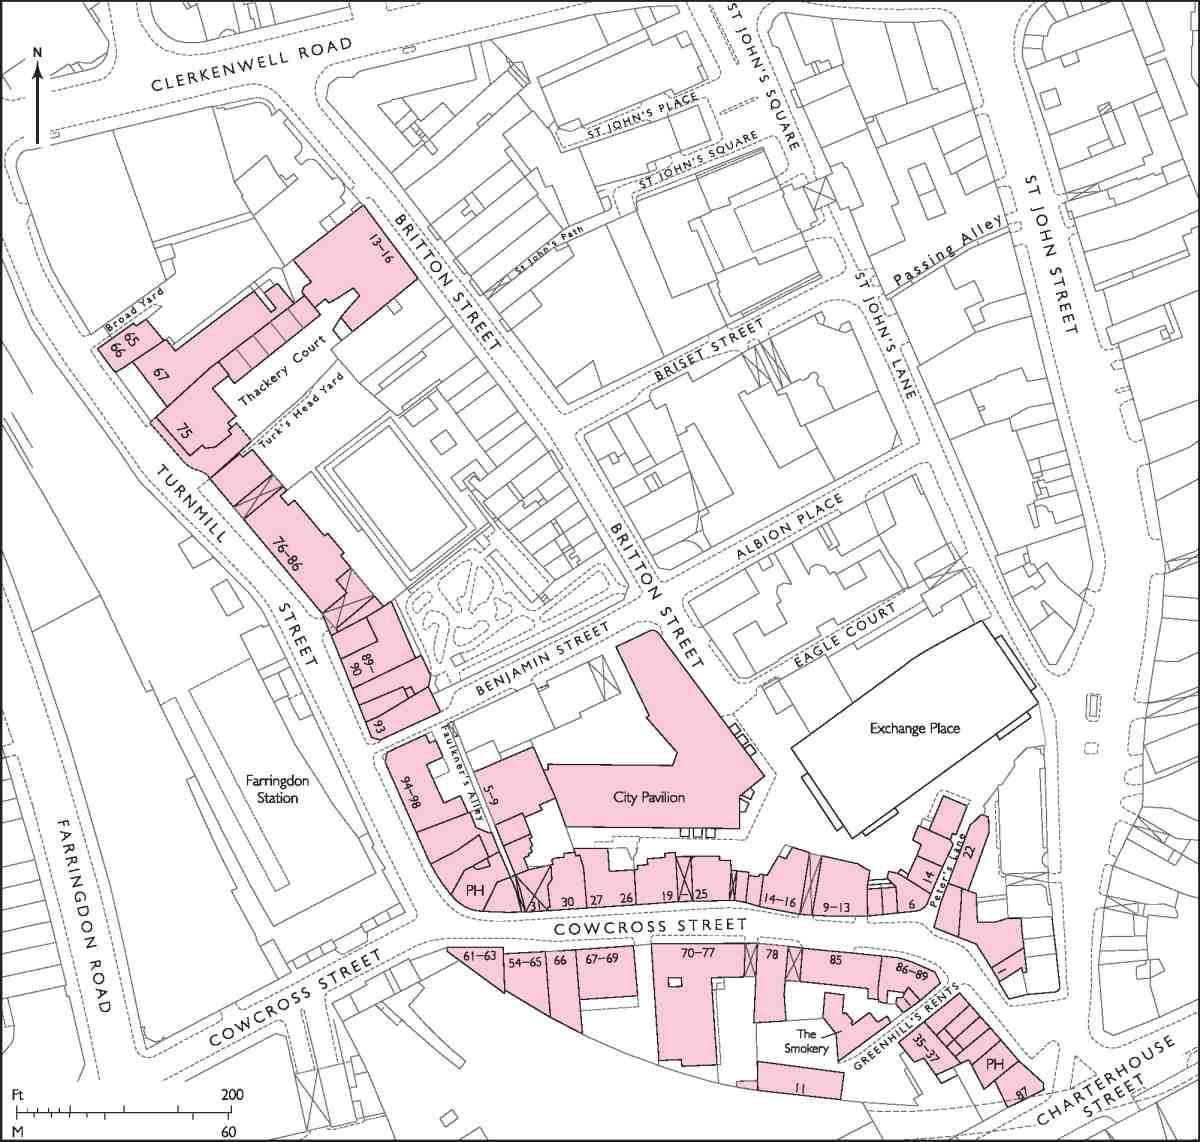 cowcross street and turnmill street british history online Hard Wood Floor chapter vii cowcross street and turnmill street